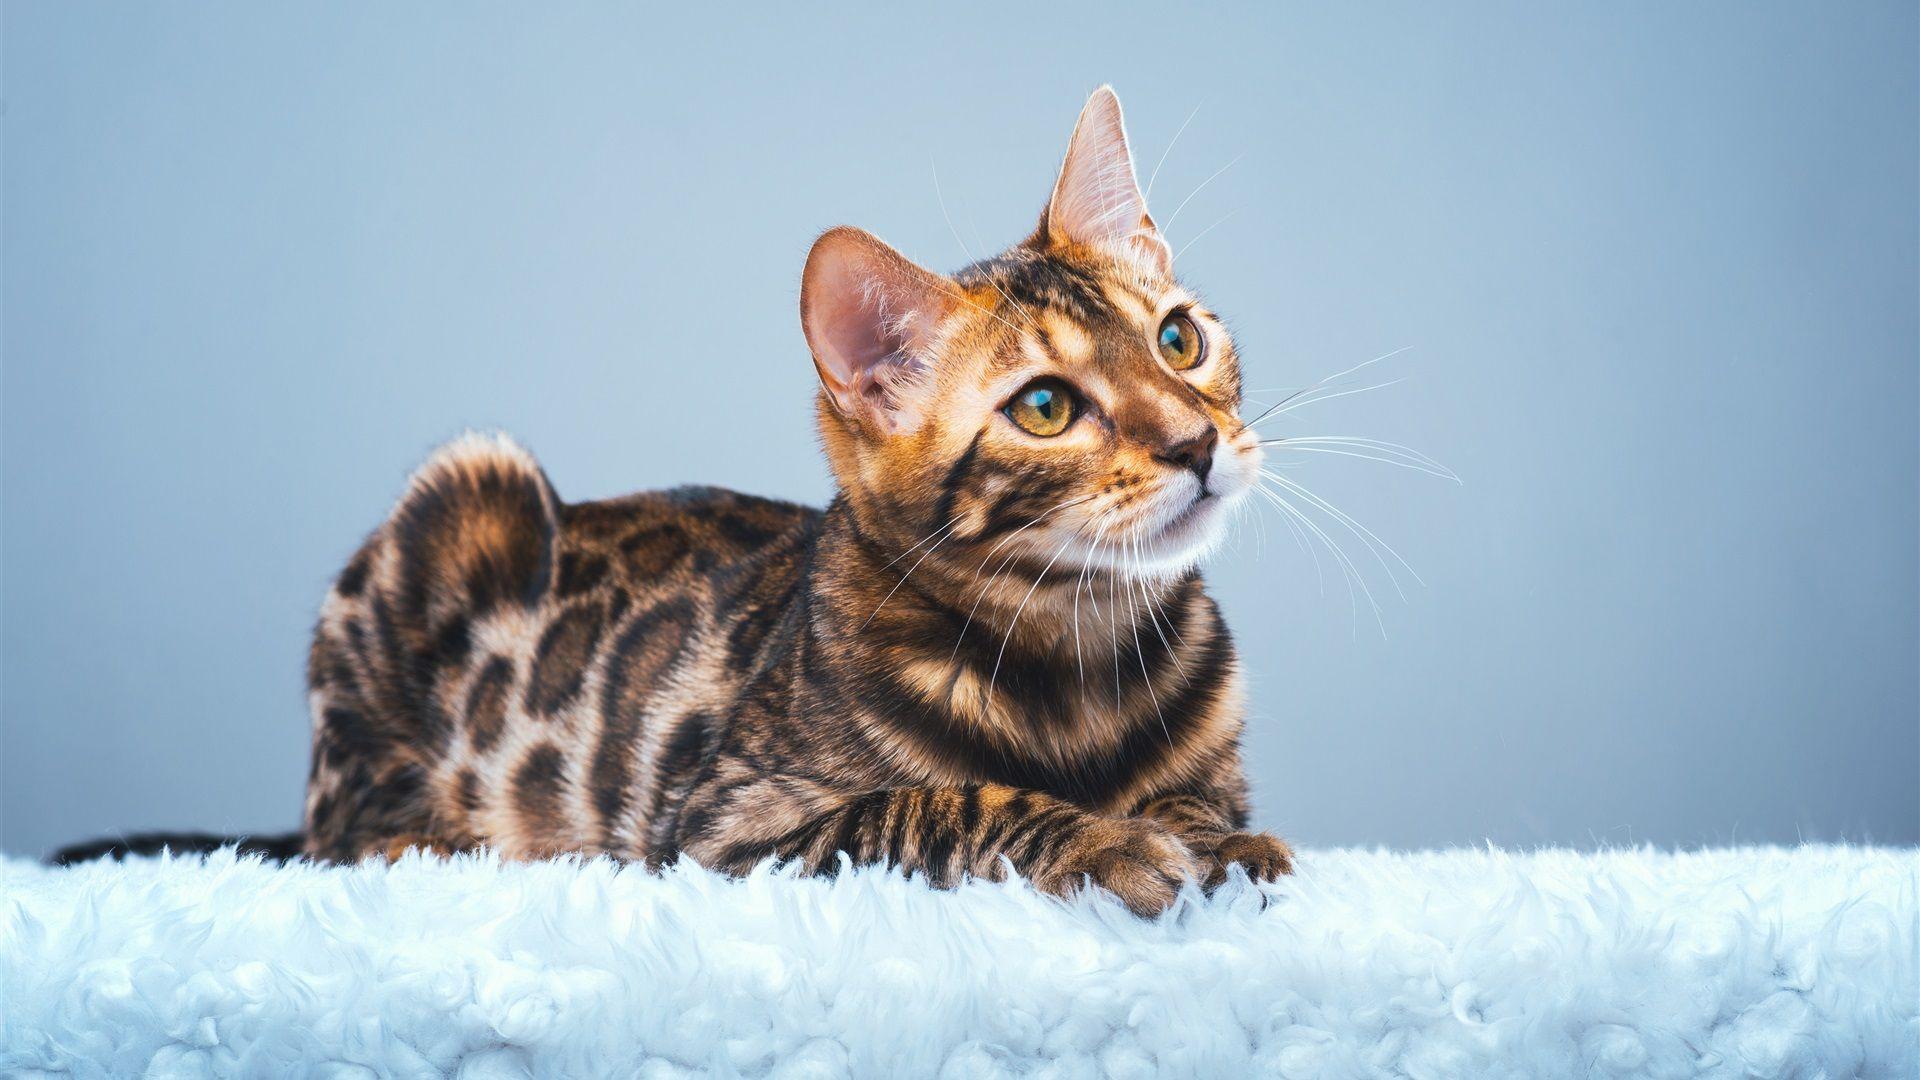 Wallpapers Cute Bengal Cat Look Upuhd K Picture, Image